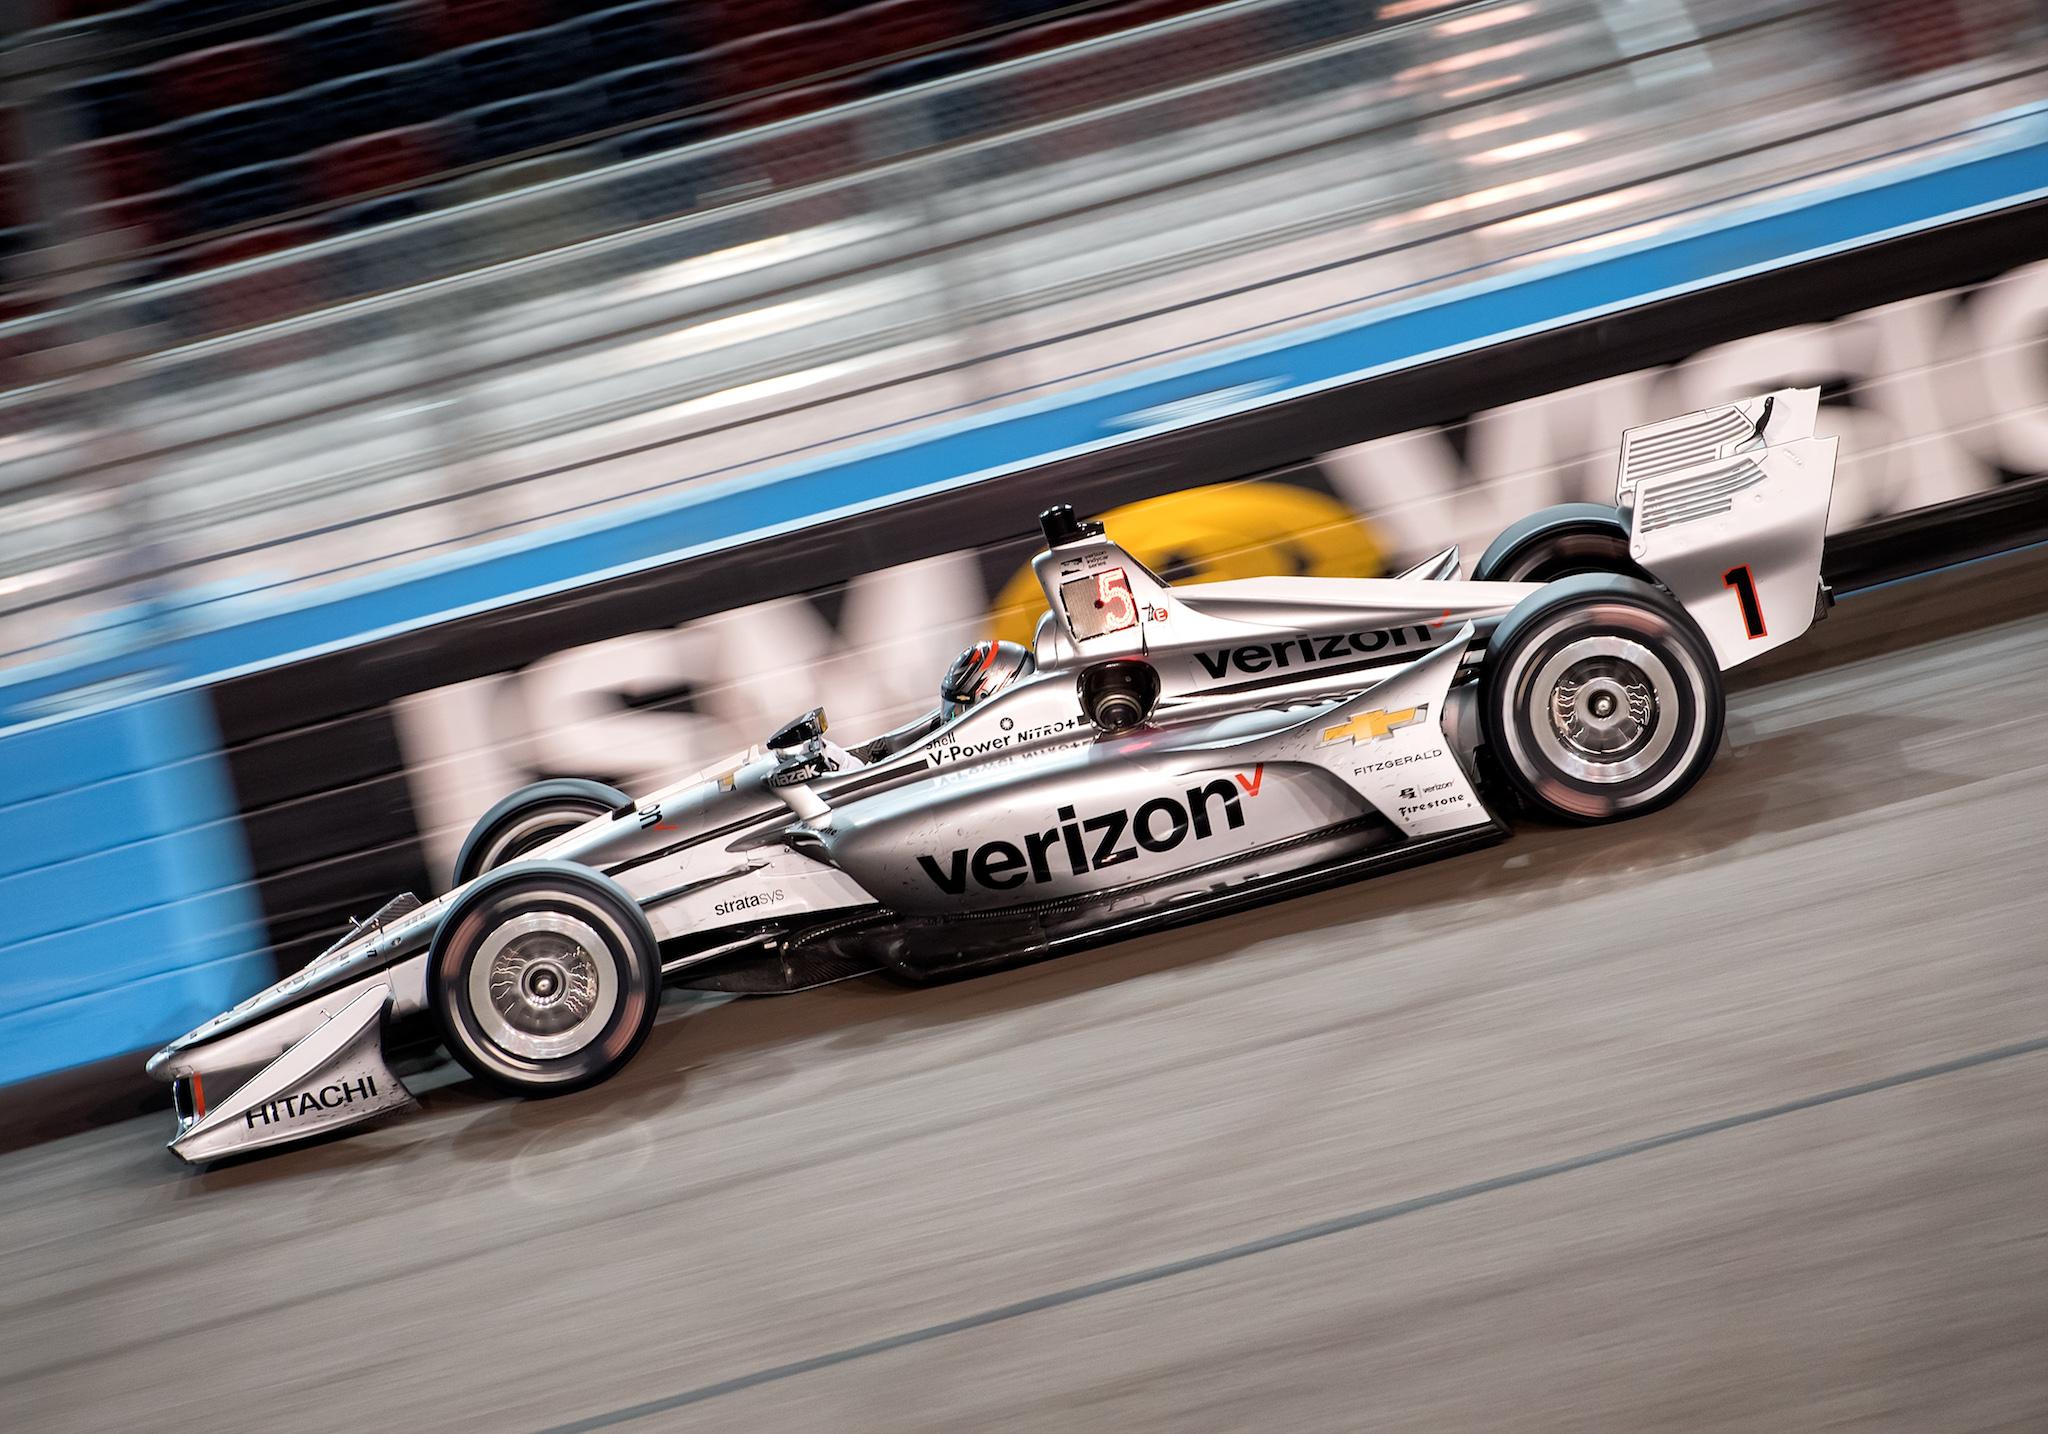 Now that's a good-looking single-seater! Team Penske driver Josef Newgarden (1) rips through turn two during the Verizon IndyCar Series Desert Diamond West Valley Casino Phoenix Grand Prix on April 7, 2018, at ISM Raceway in Phoenix, AZ.